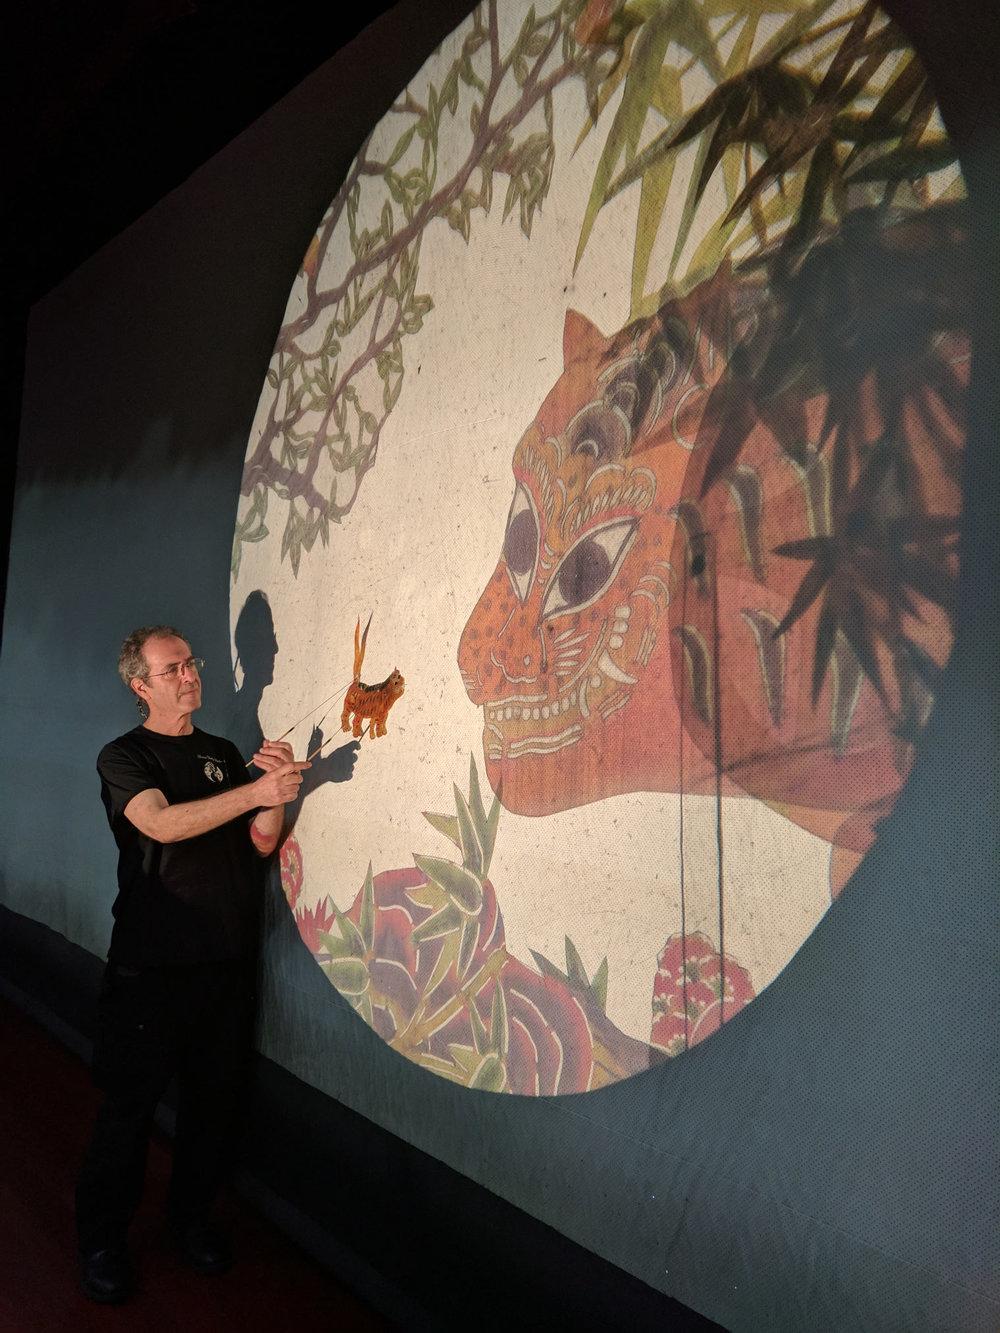 CTW's co-Artistic Director Stephen Kaplin with shadow figures after the show in Shenzhen中国戏剧工作坊的艺术总监史蒂芬.凯派林在深圳的皮影戏演出后